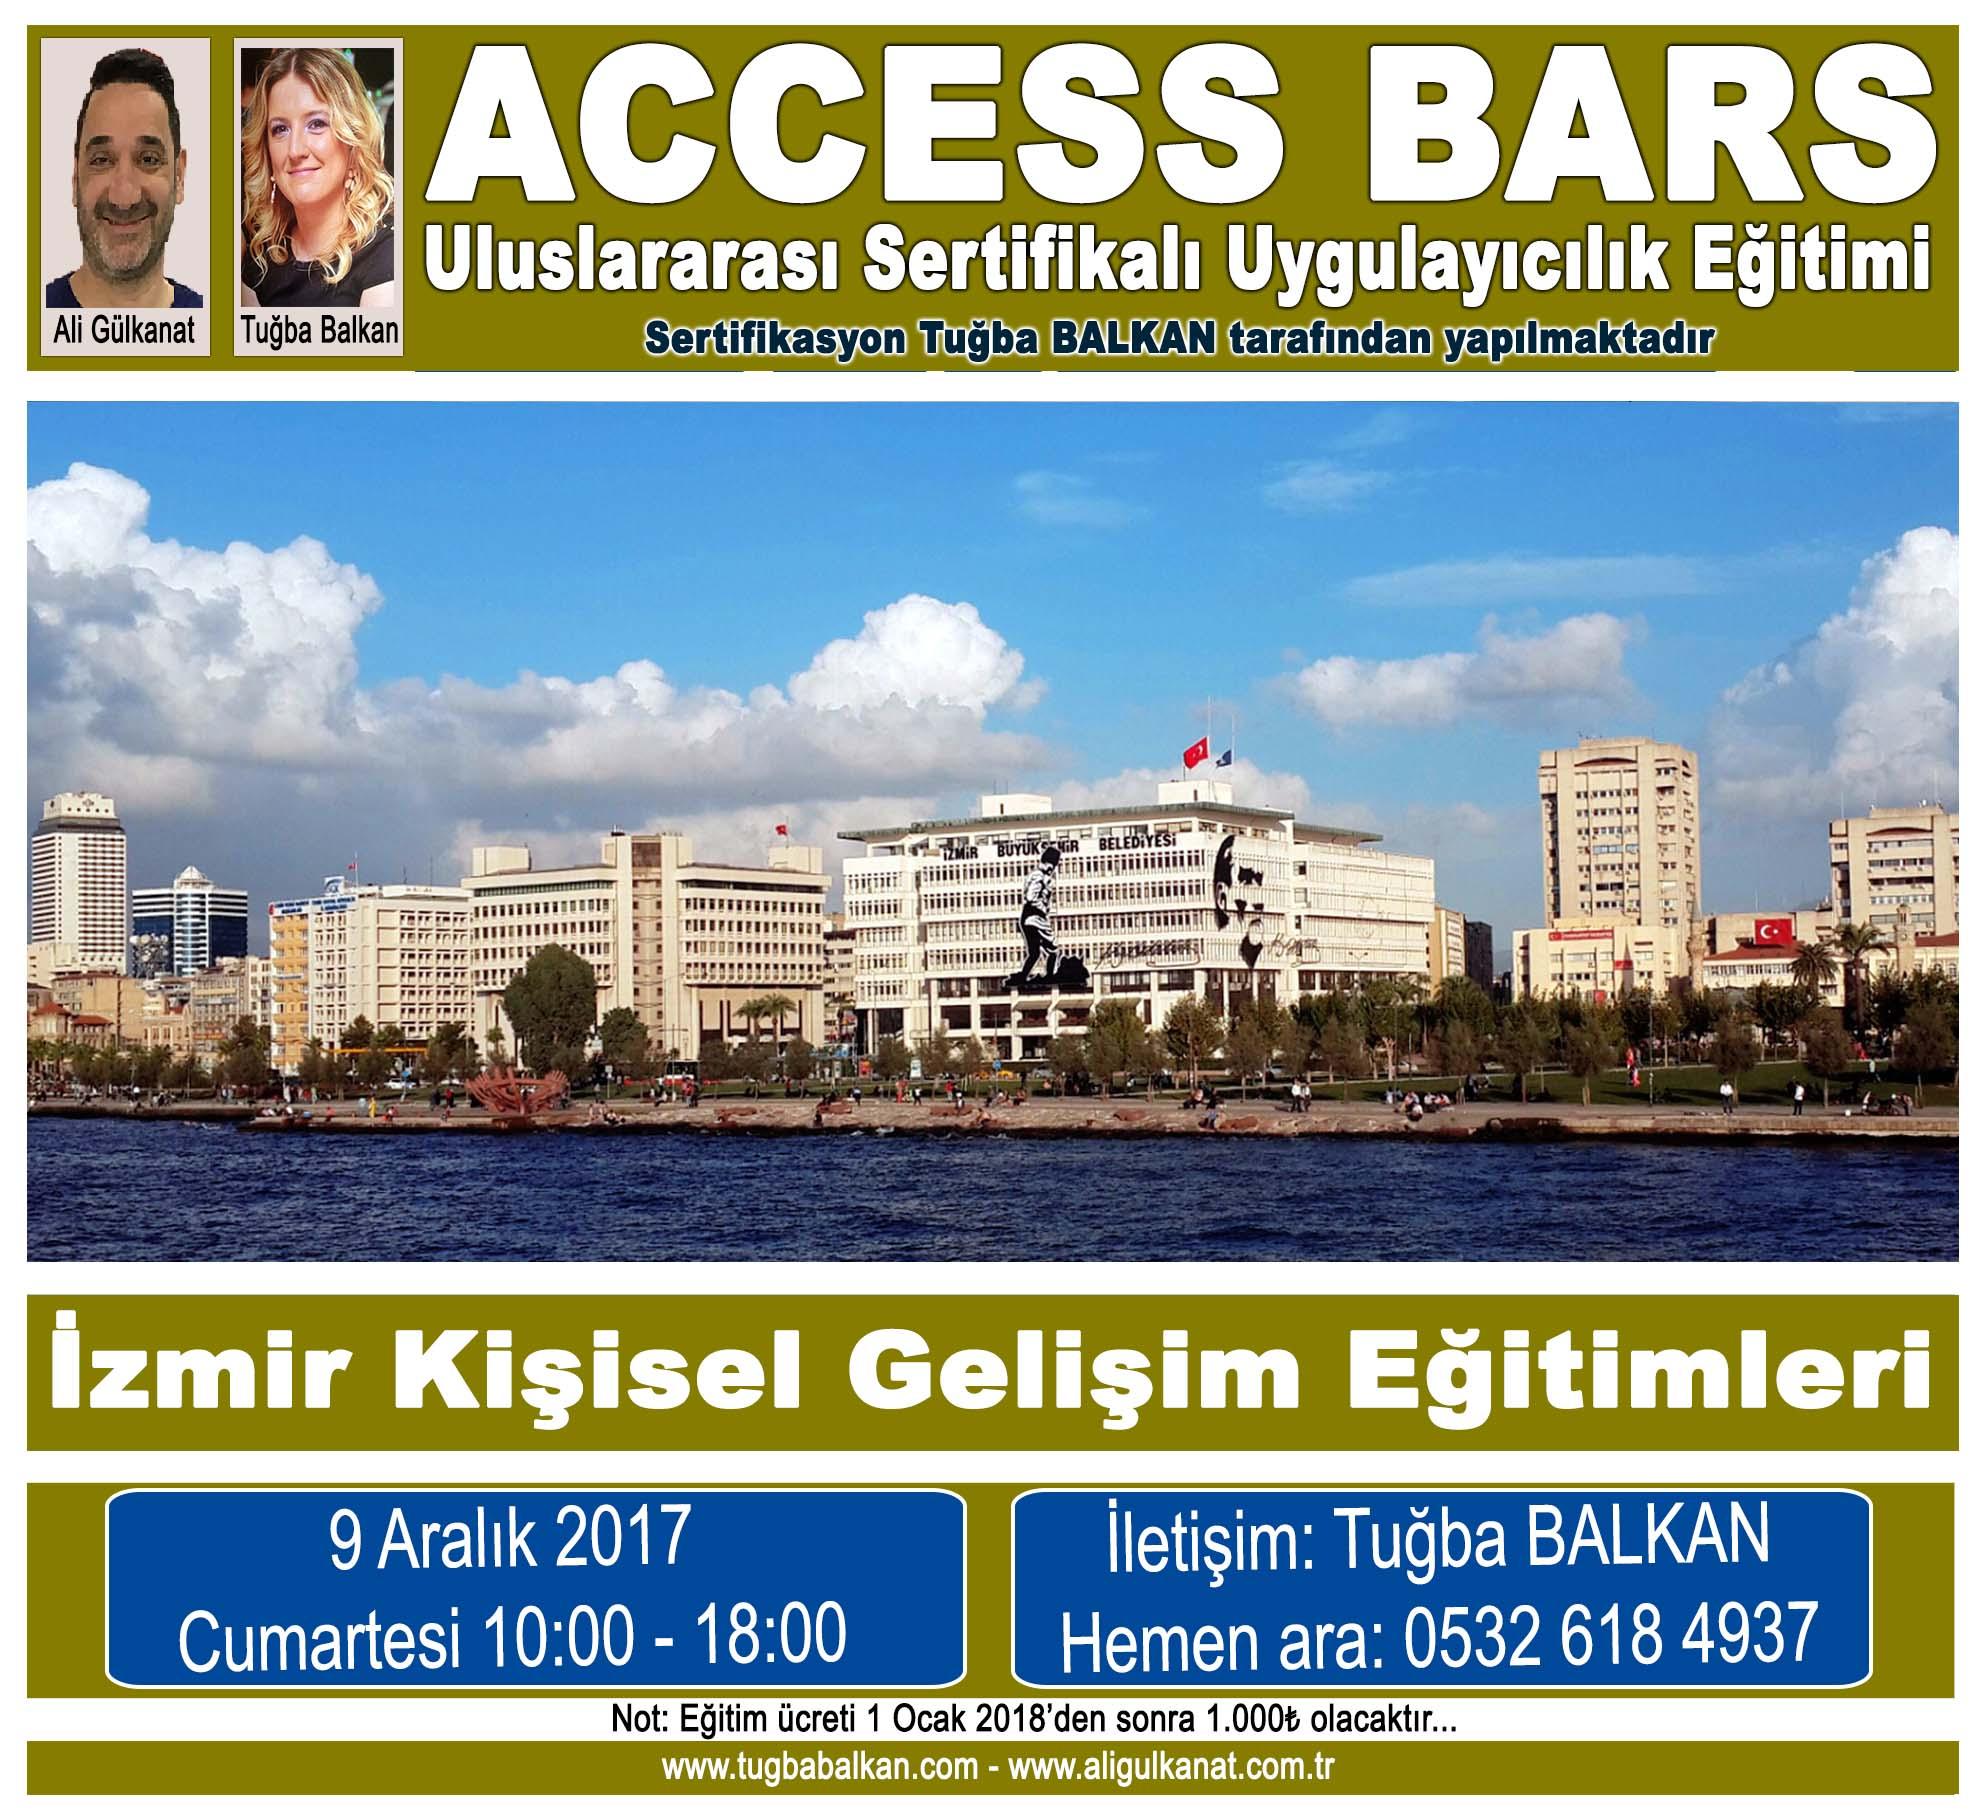 access-bars-tanitim-9-aralik-2